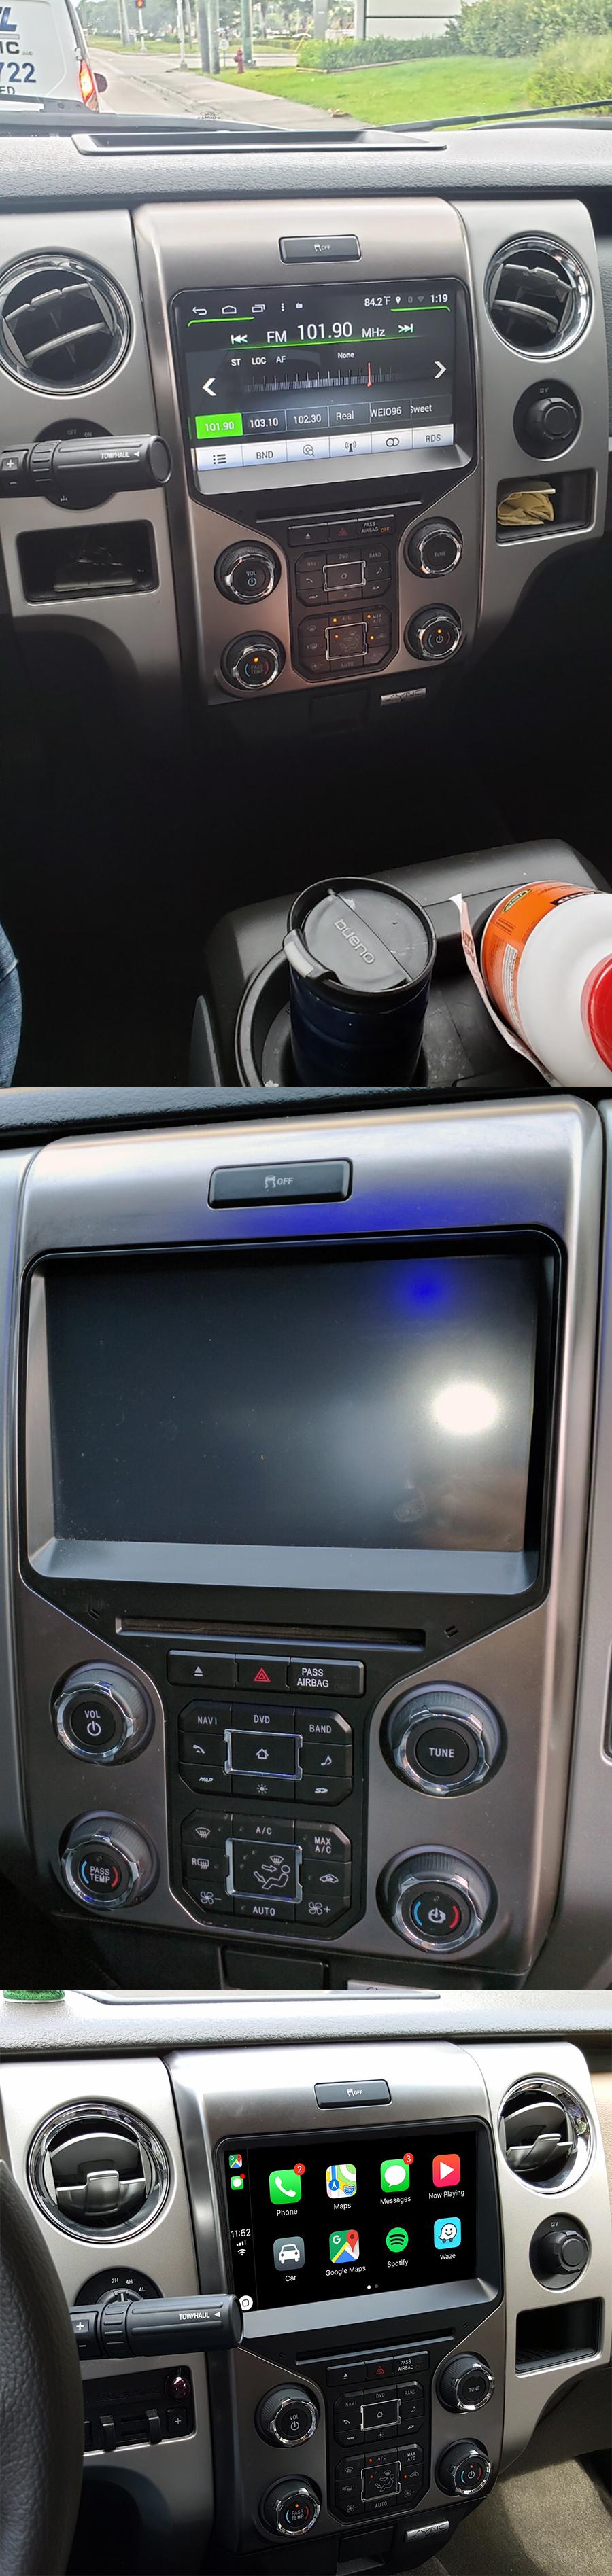 Aftermarket Navigation Head Unit For Ford F-150 2013-2014